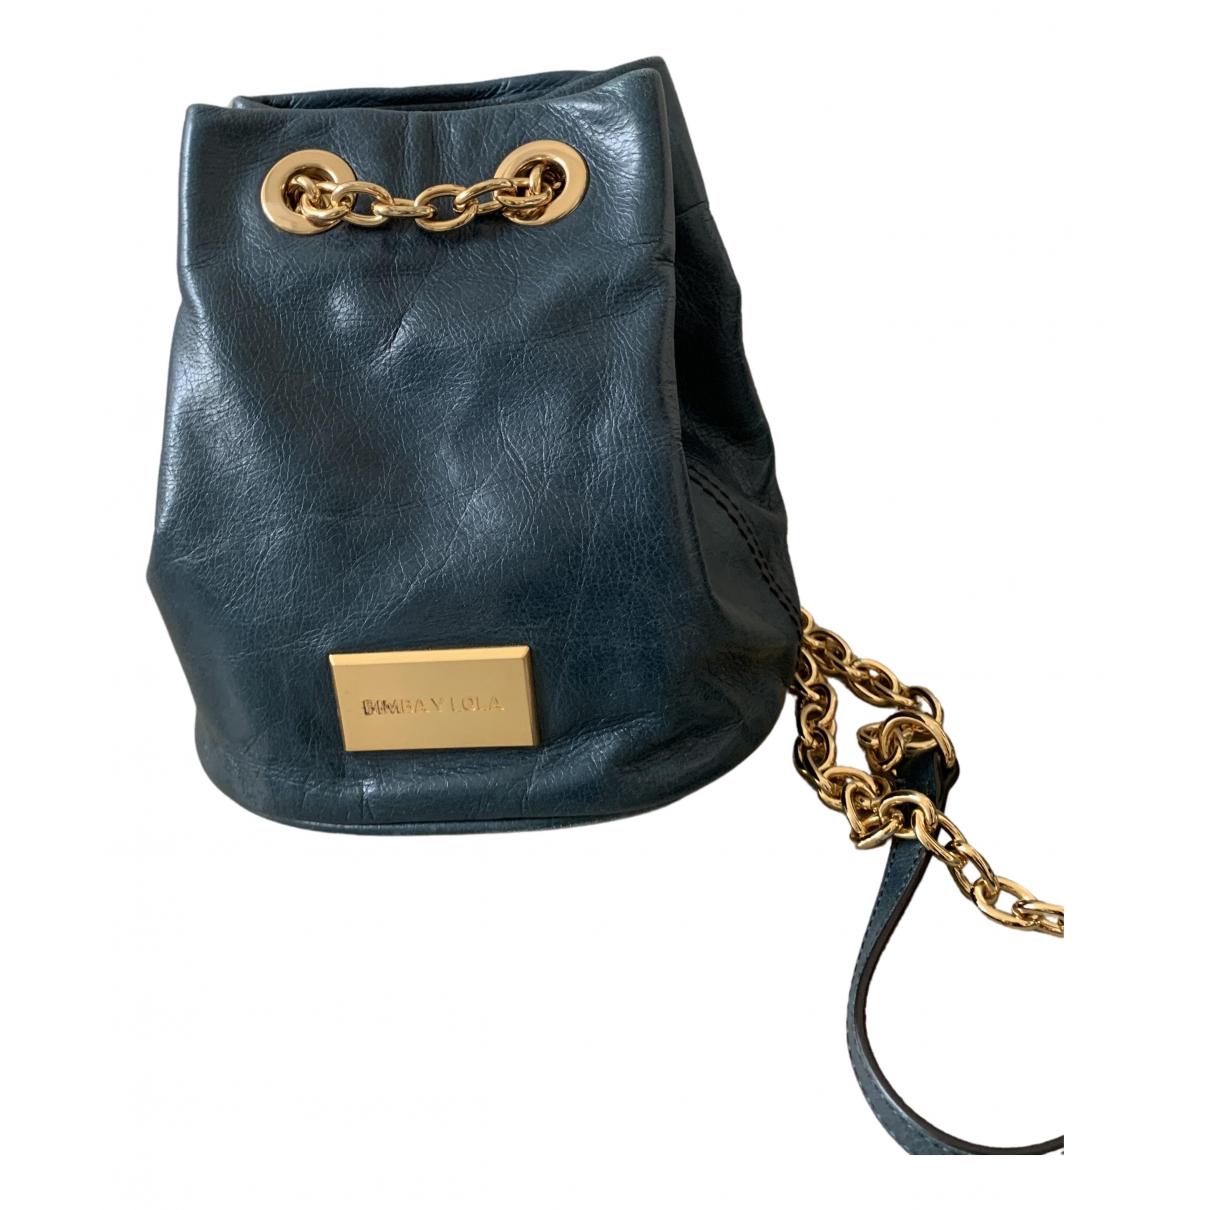 Bimba Y Lola \N Green Leather handbag for Women \N